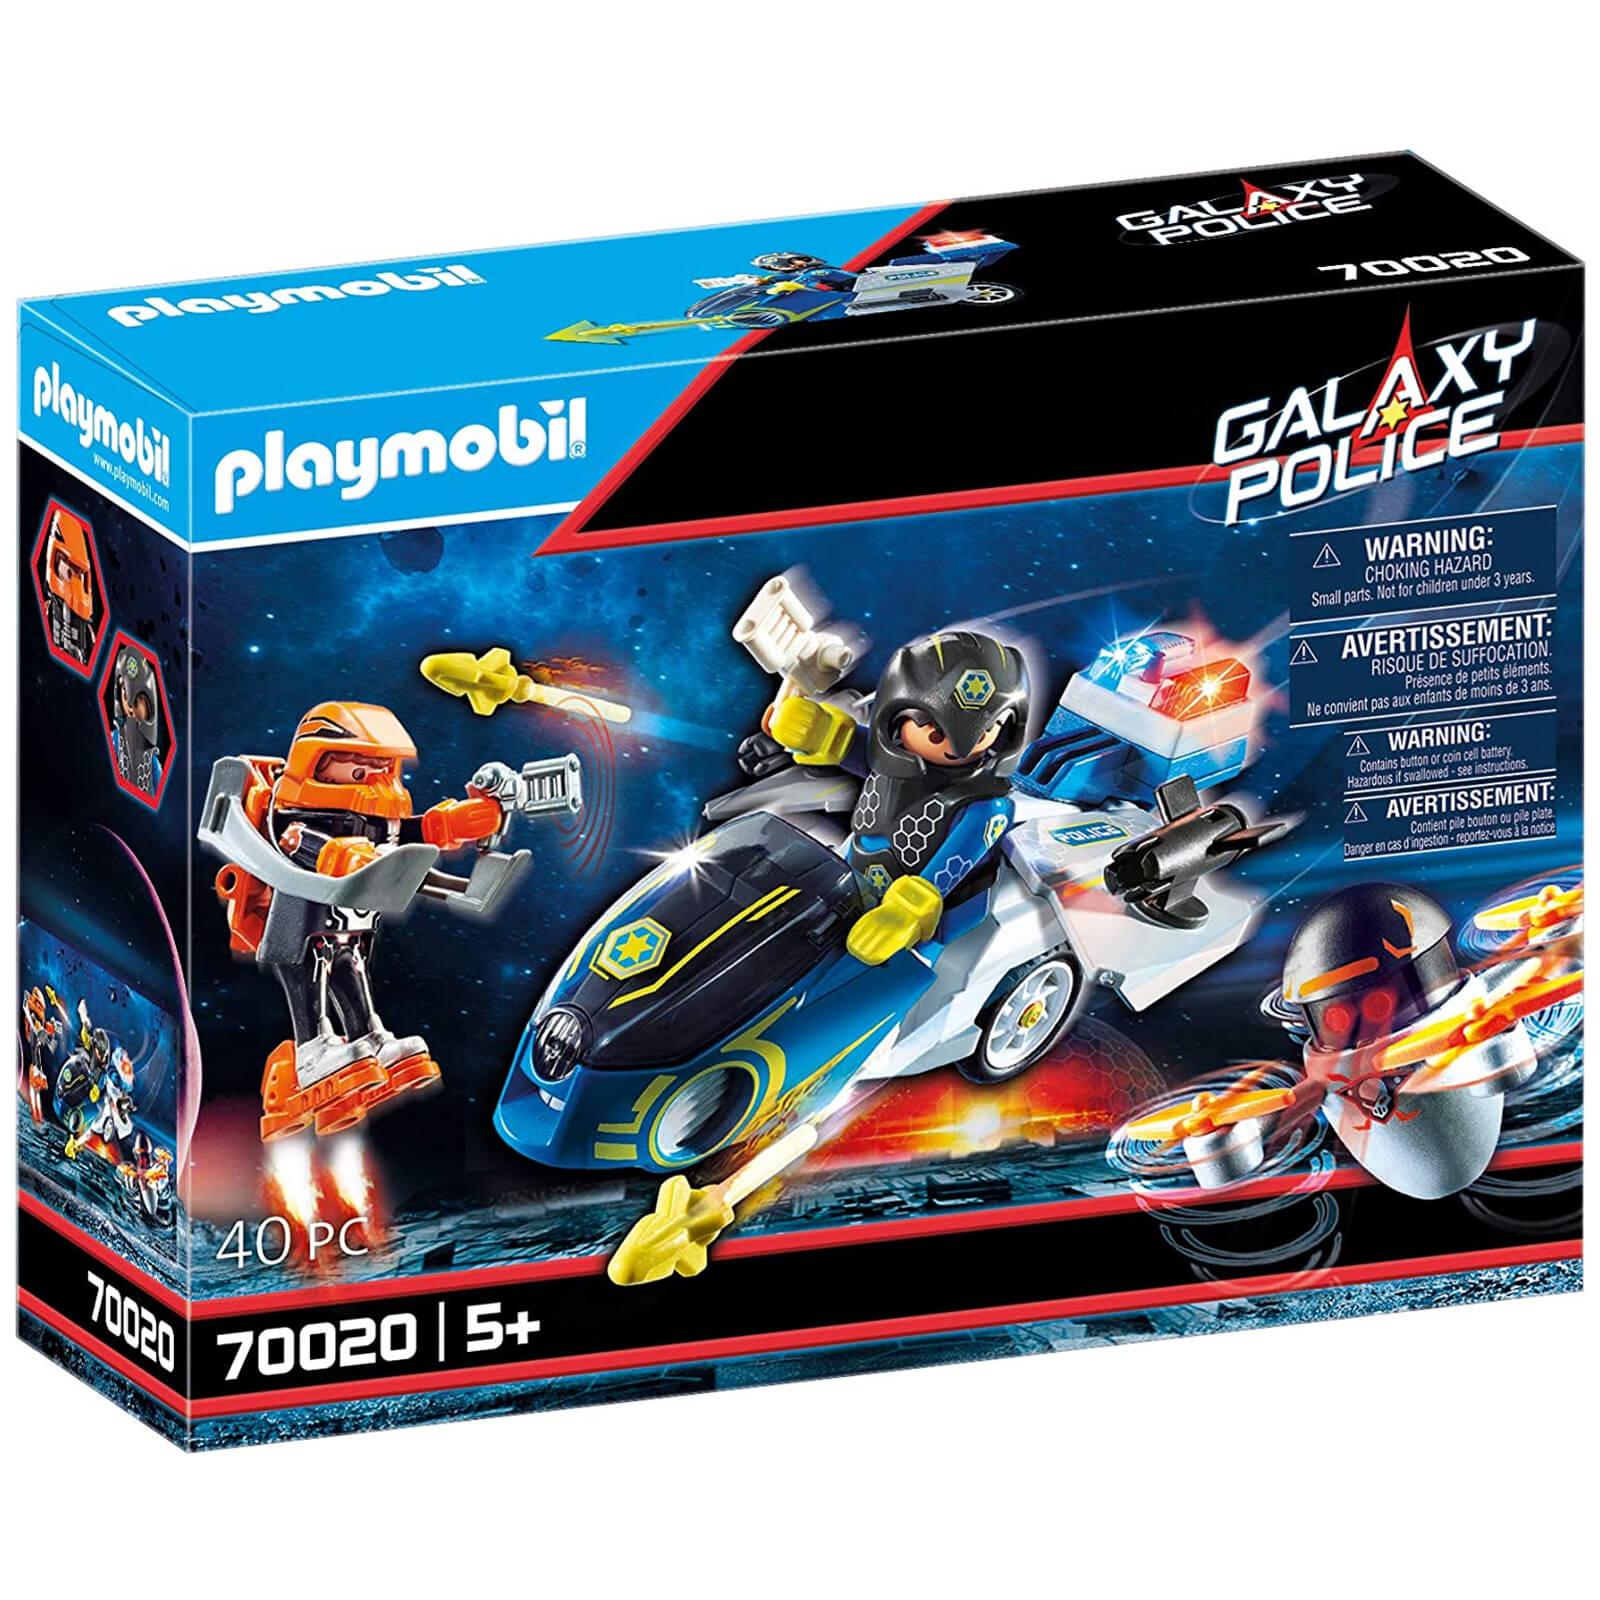 Playmobil Galaxy Police Bike (70020)